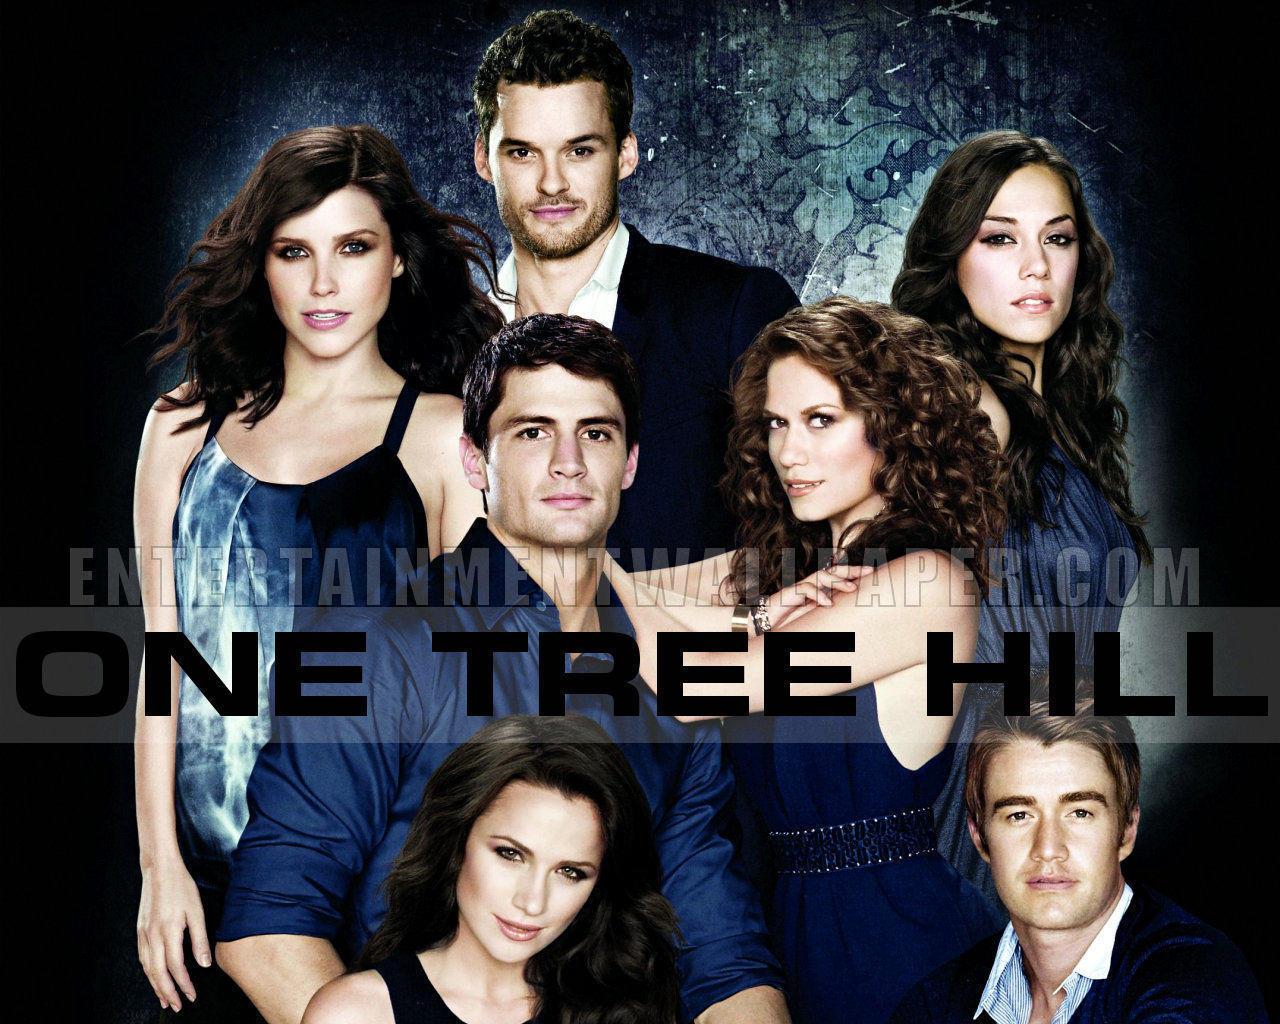 Chad Michael Murray One Tree Hill Season 1